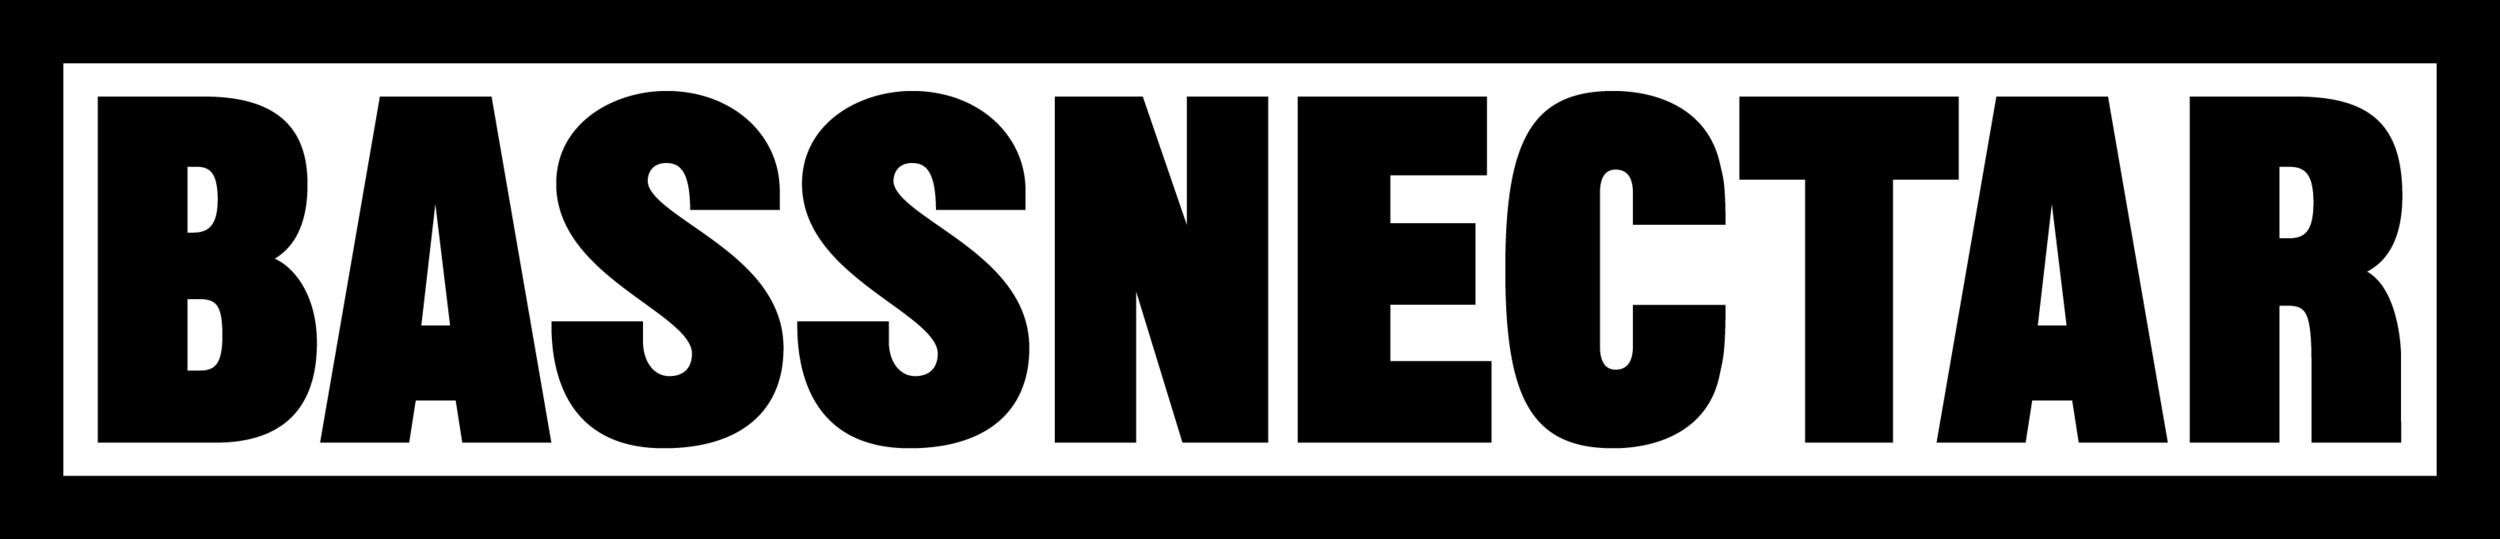 Bassnectar-TypeSolidLOGO2012.png